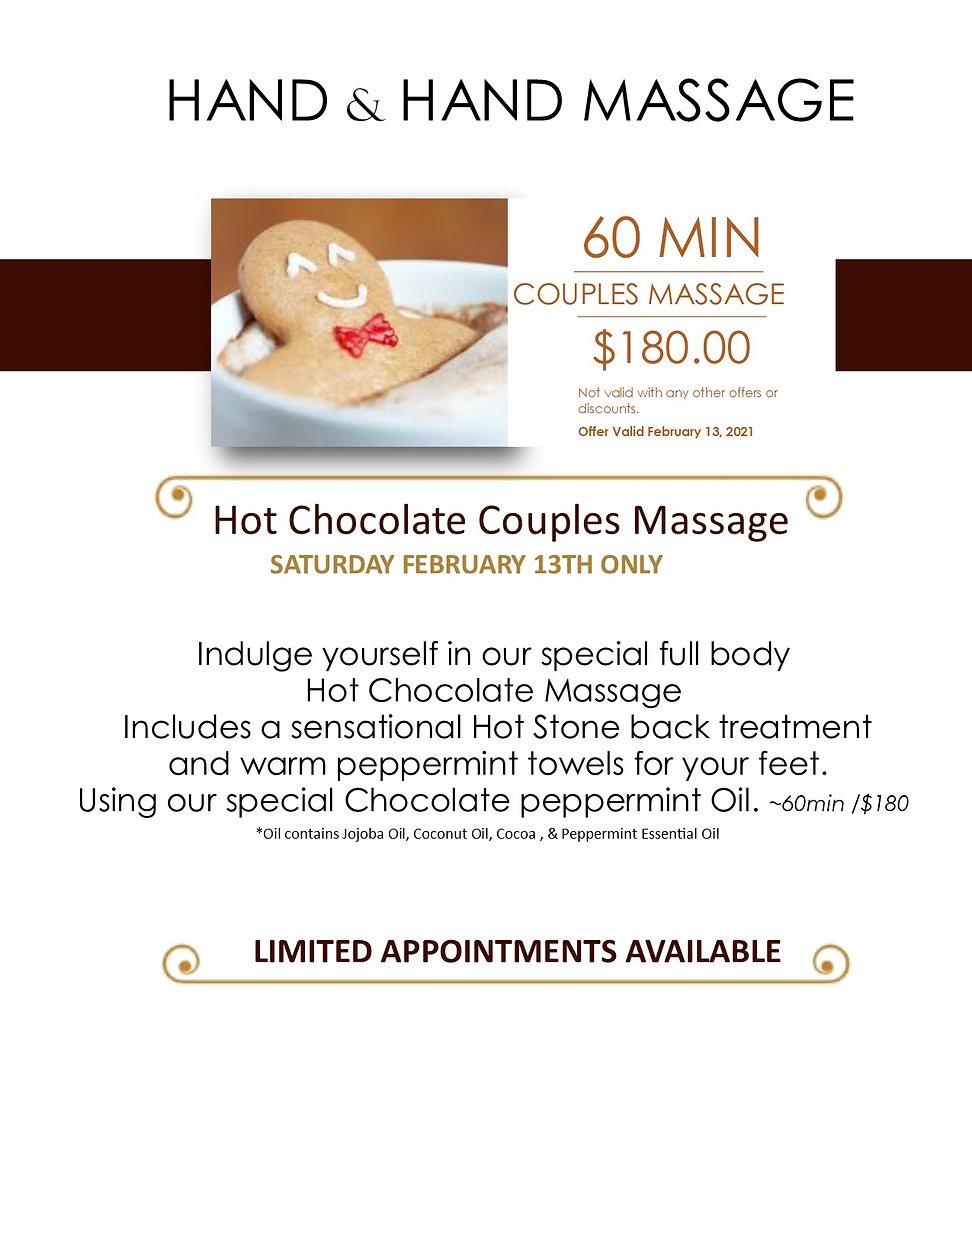 hand and hand massage flyer website.jpg